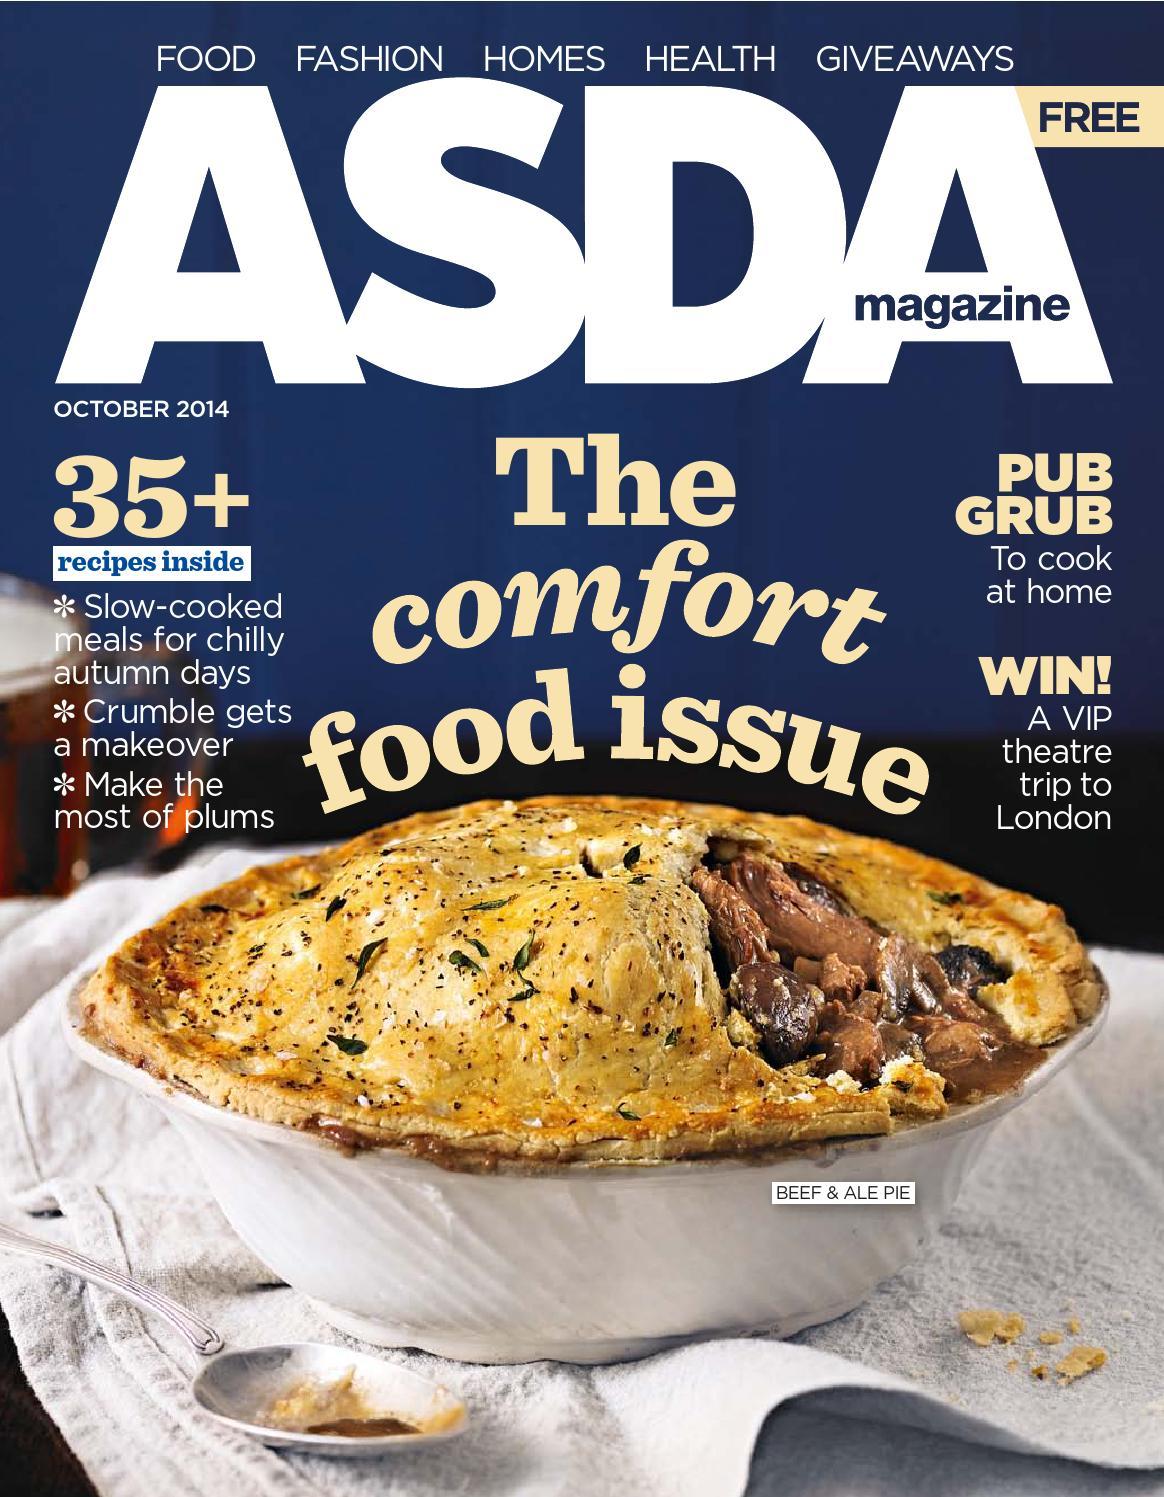 Asda magazine october 2014 by asda issuu solutioingenieria Choice Image